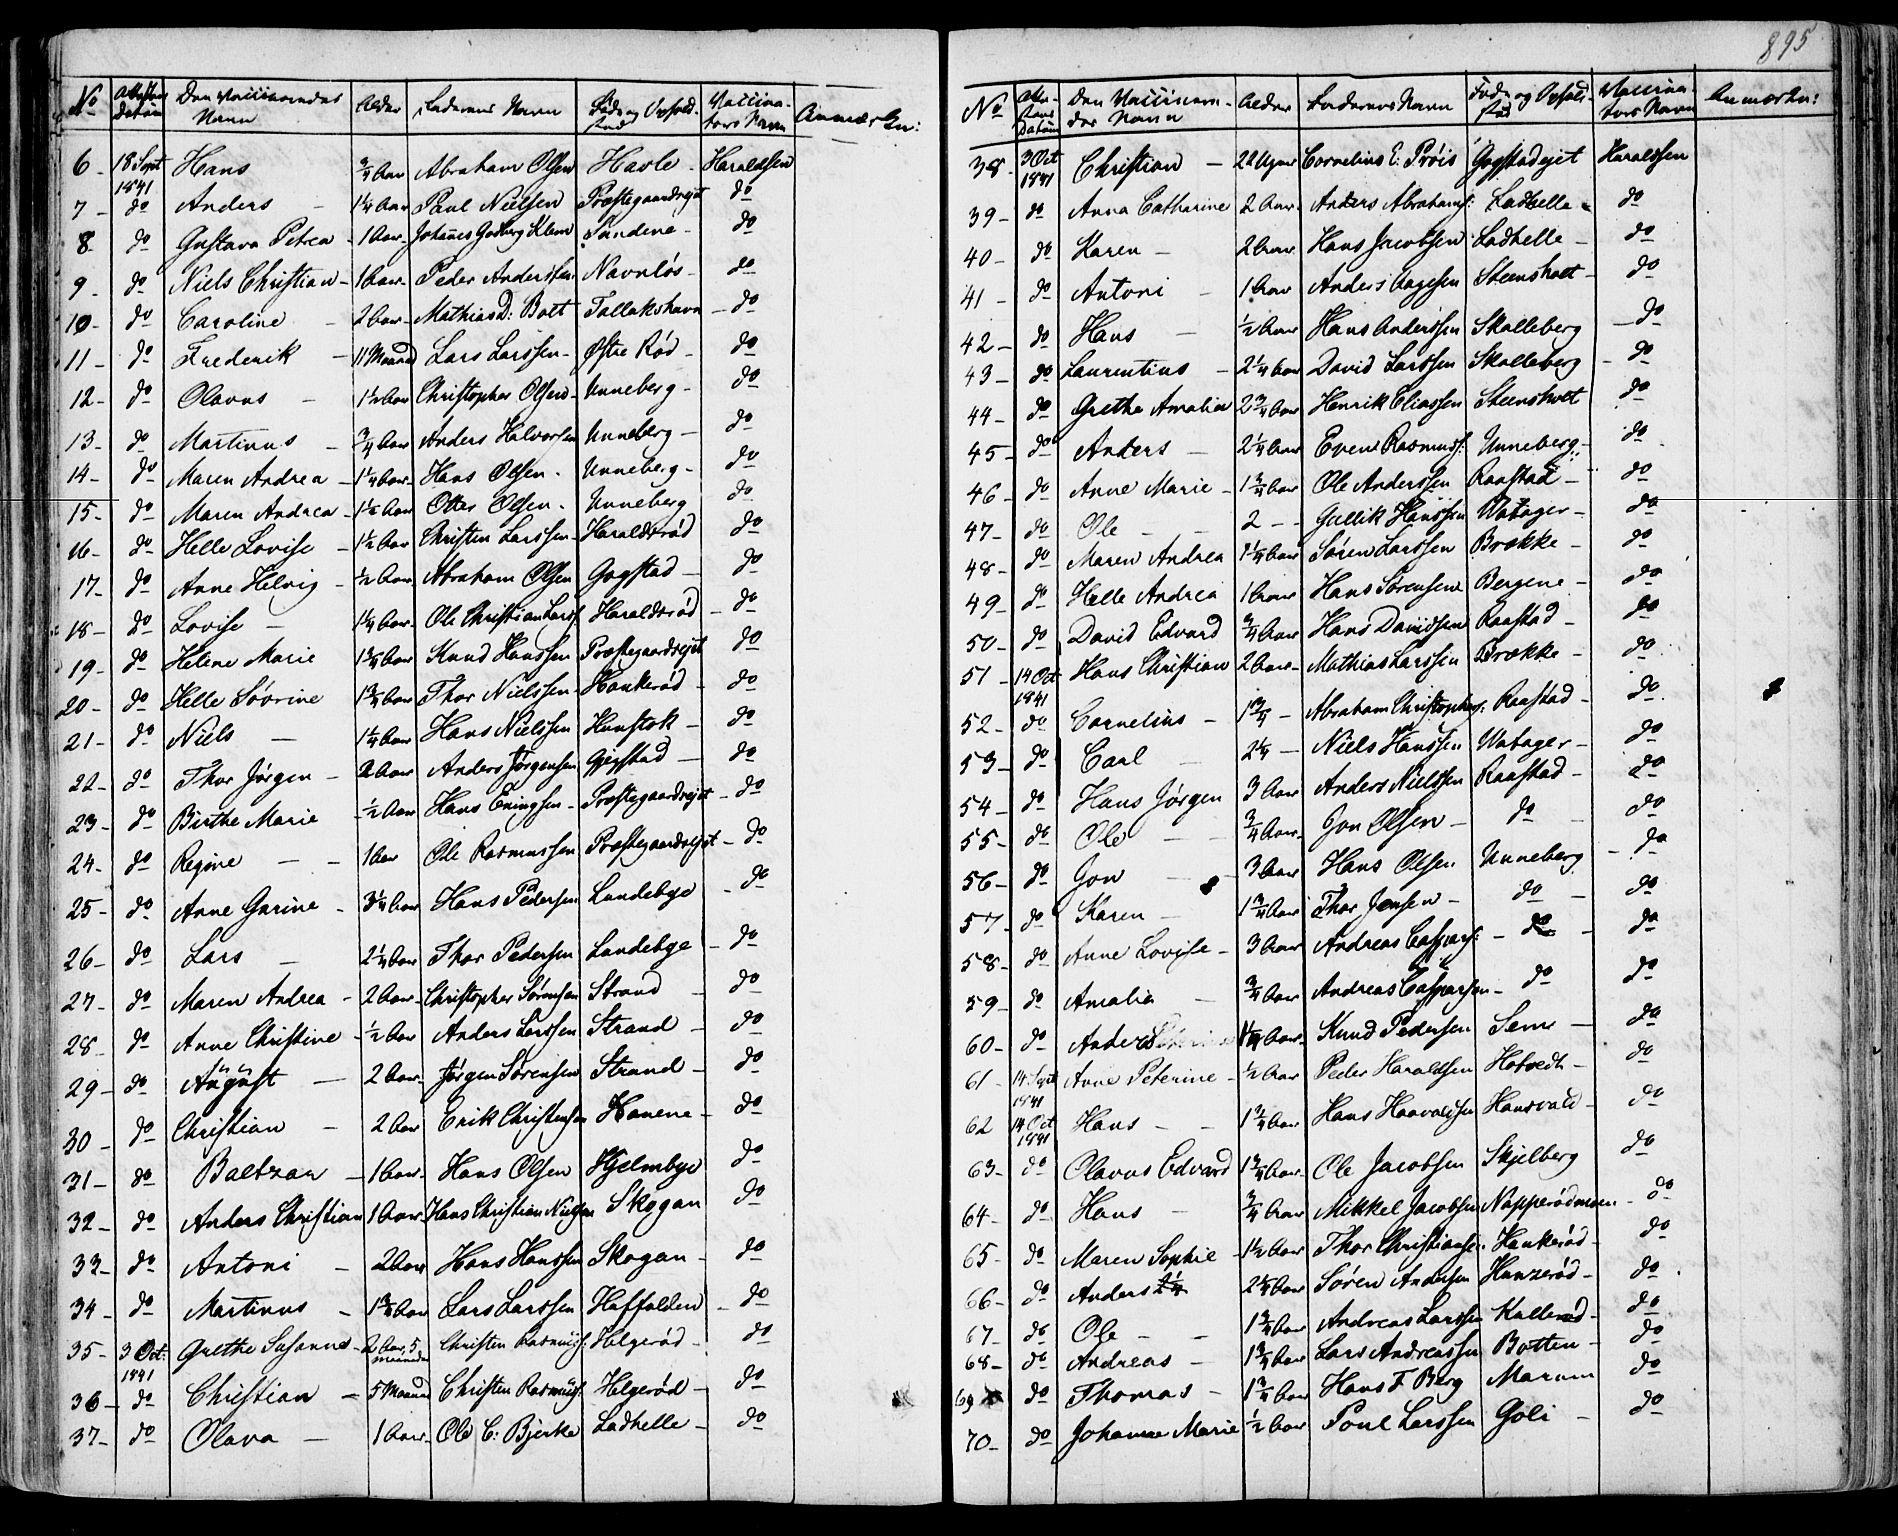 SAKO, Sandar kirkebøker, F/Fa/L0005: Parish register (official) no. 5, 1832-1847, p. 894-895